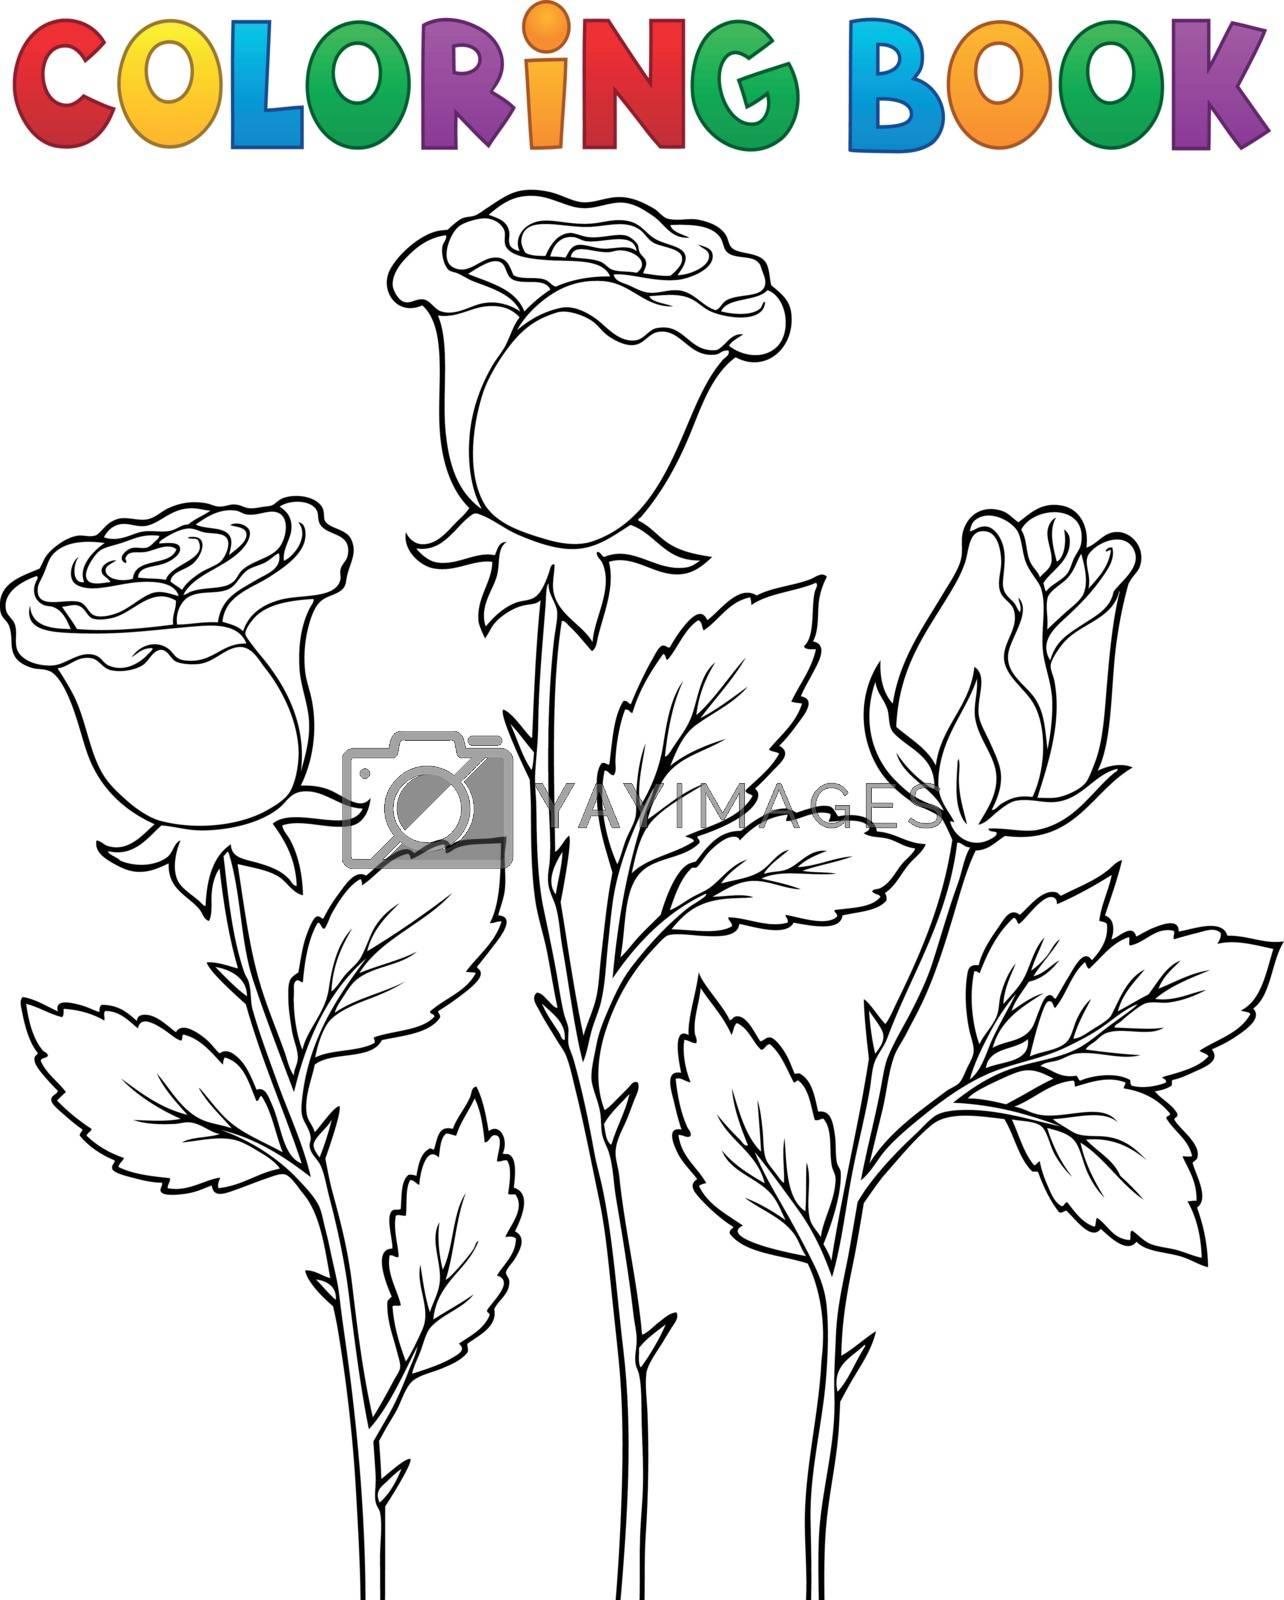 Coloring book rose flower image 1 - eps10 vector illustration.